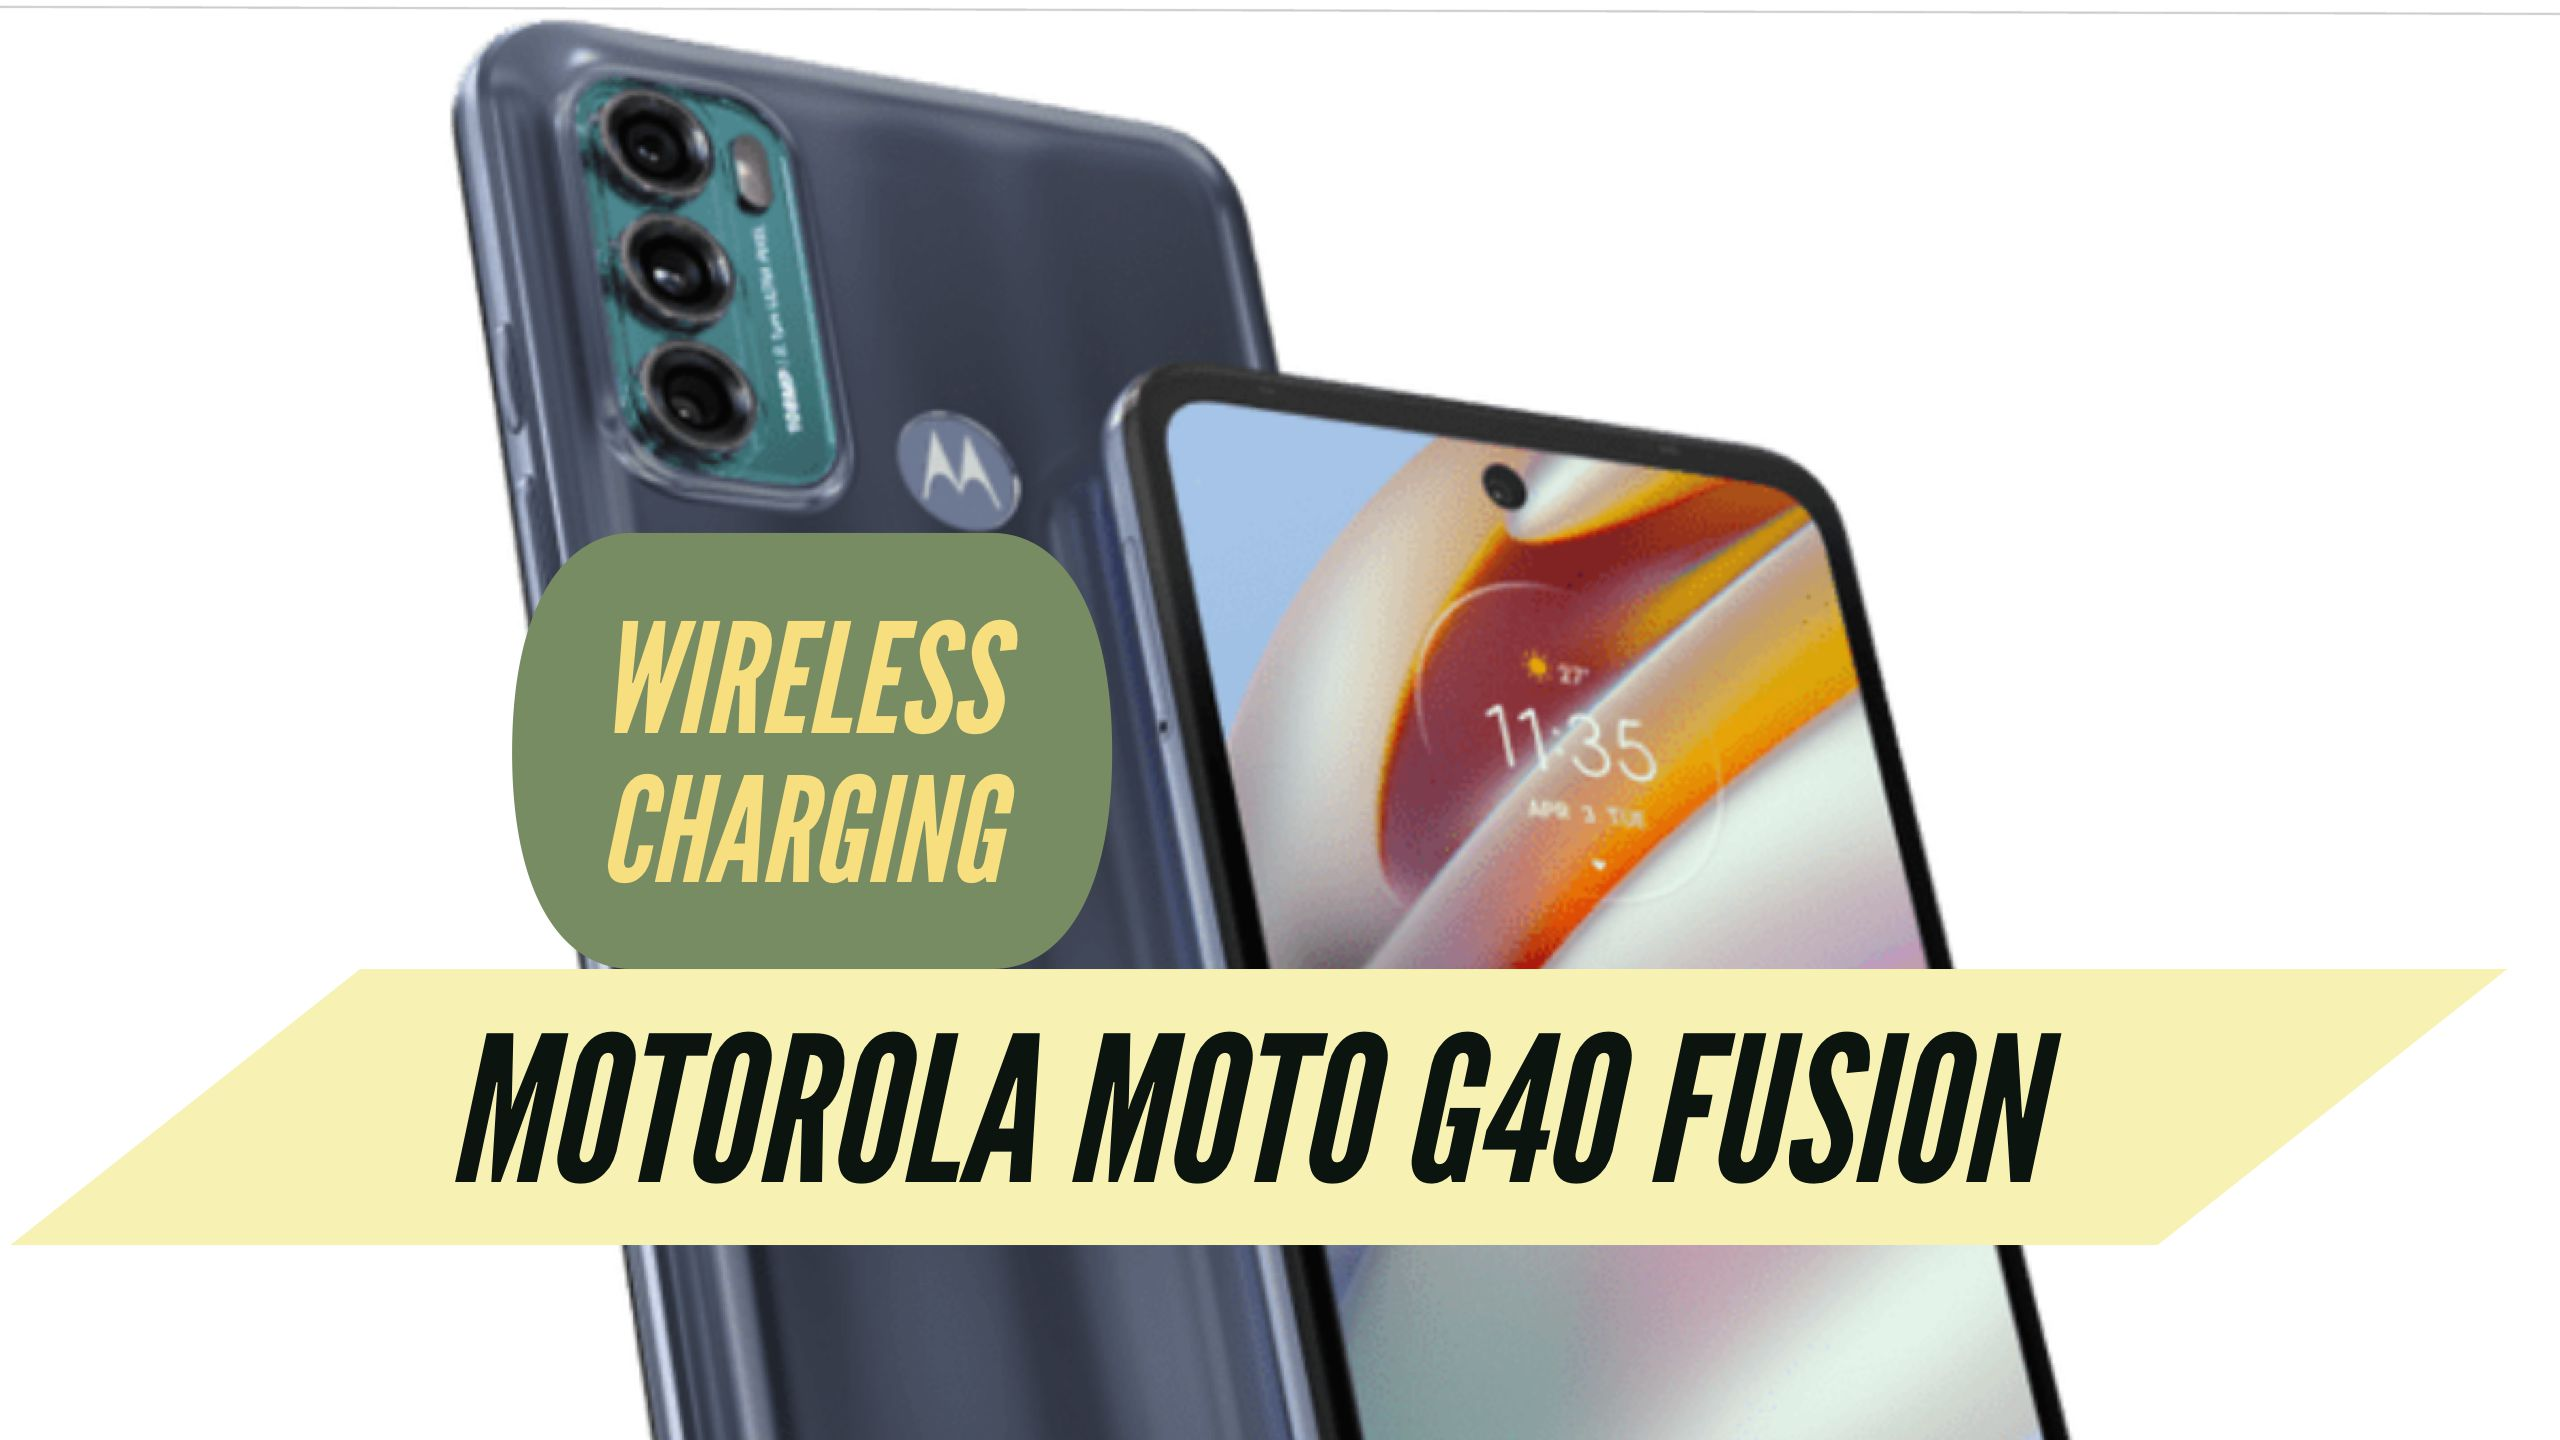 Motorola Moto G40 Fusion Wireless Charging